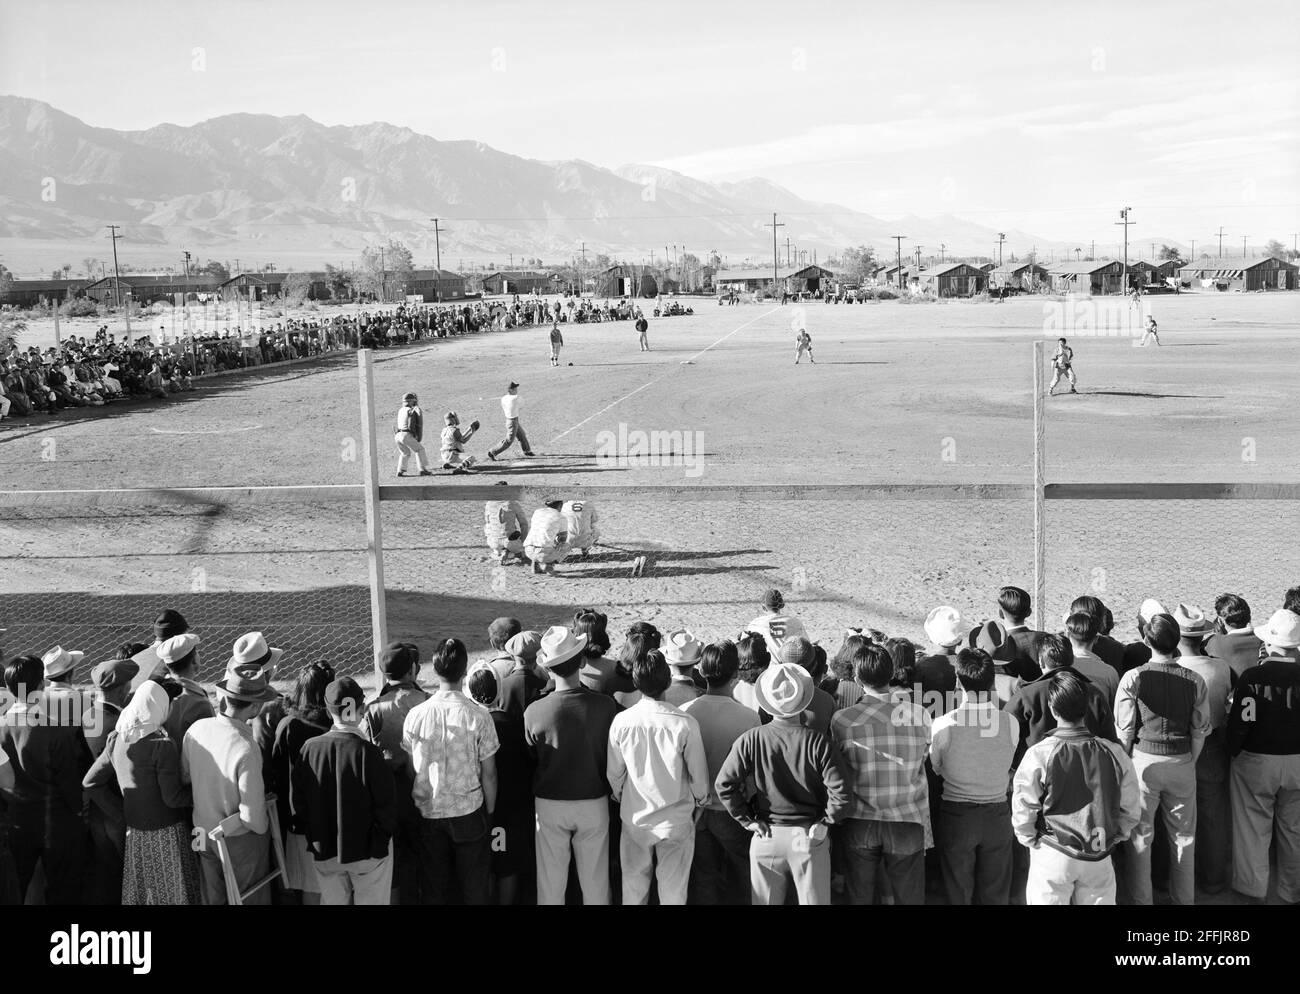 Match de baseball, Manzanar Relocation Center, Californie, États-Unis, Ansel Adams, Collection Manzanar War Relocation Centre, 1943 Banque D'Images